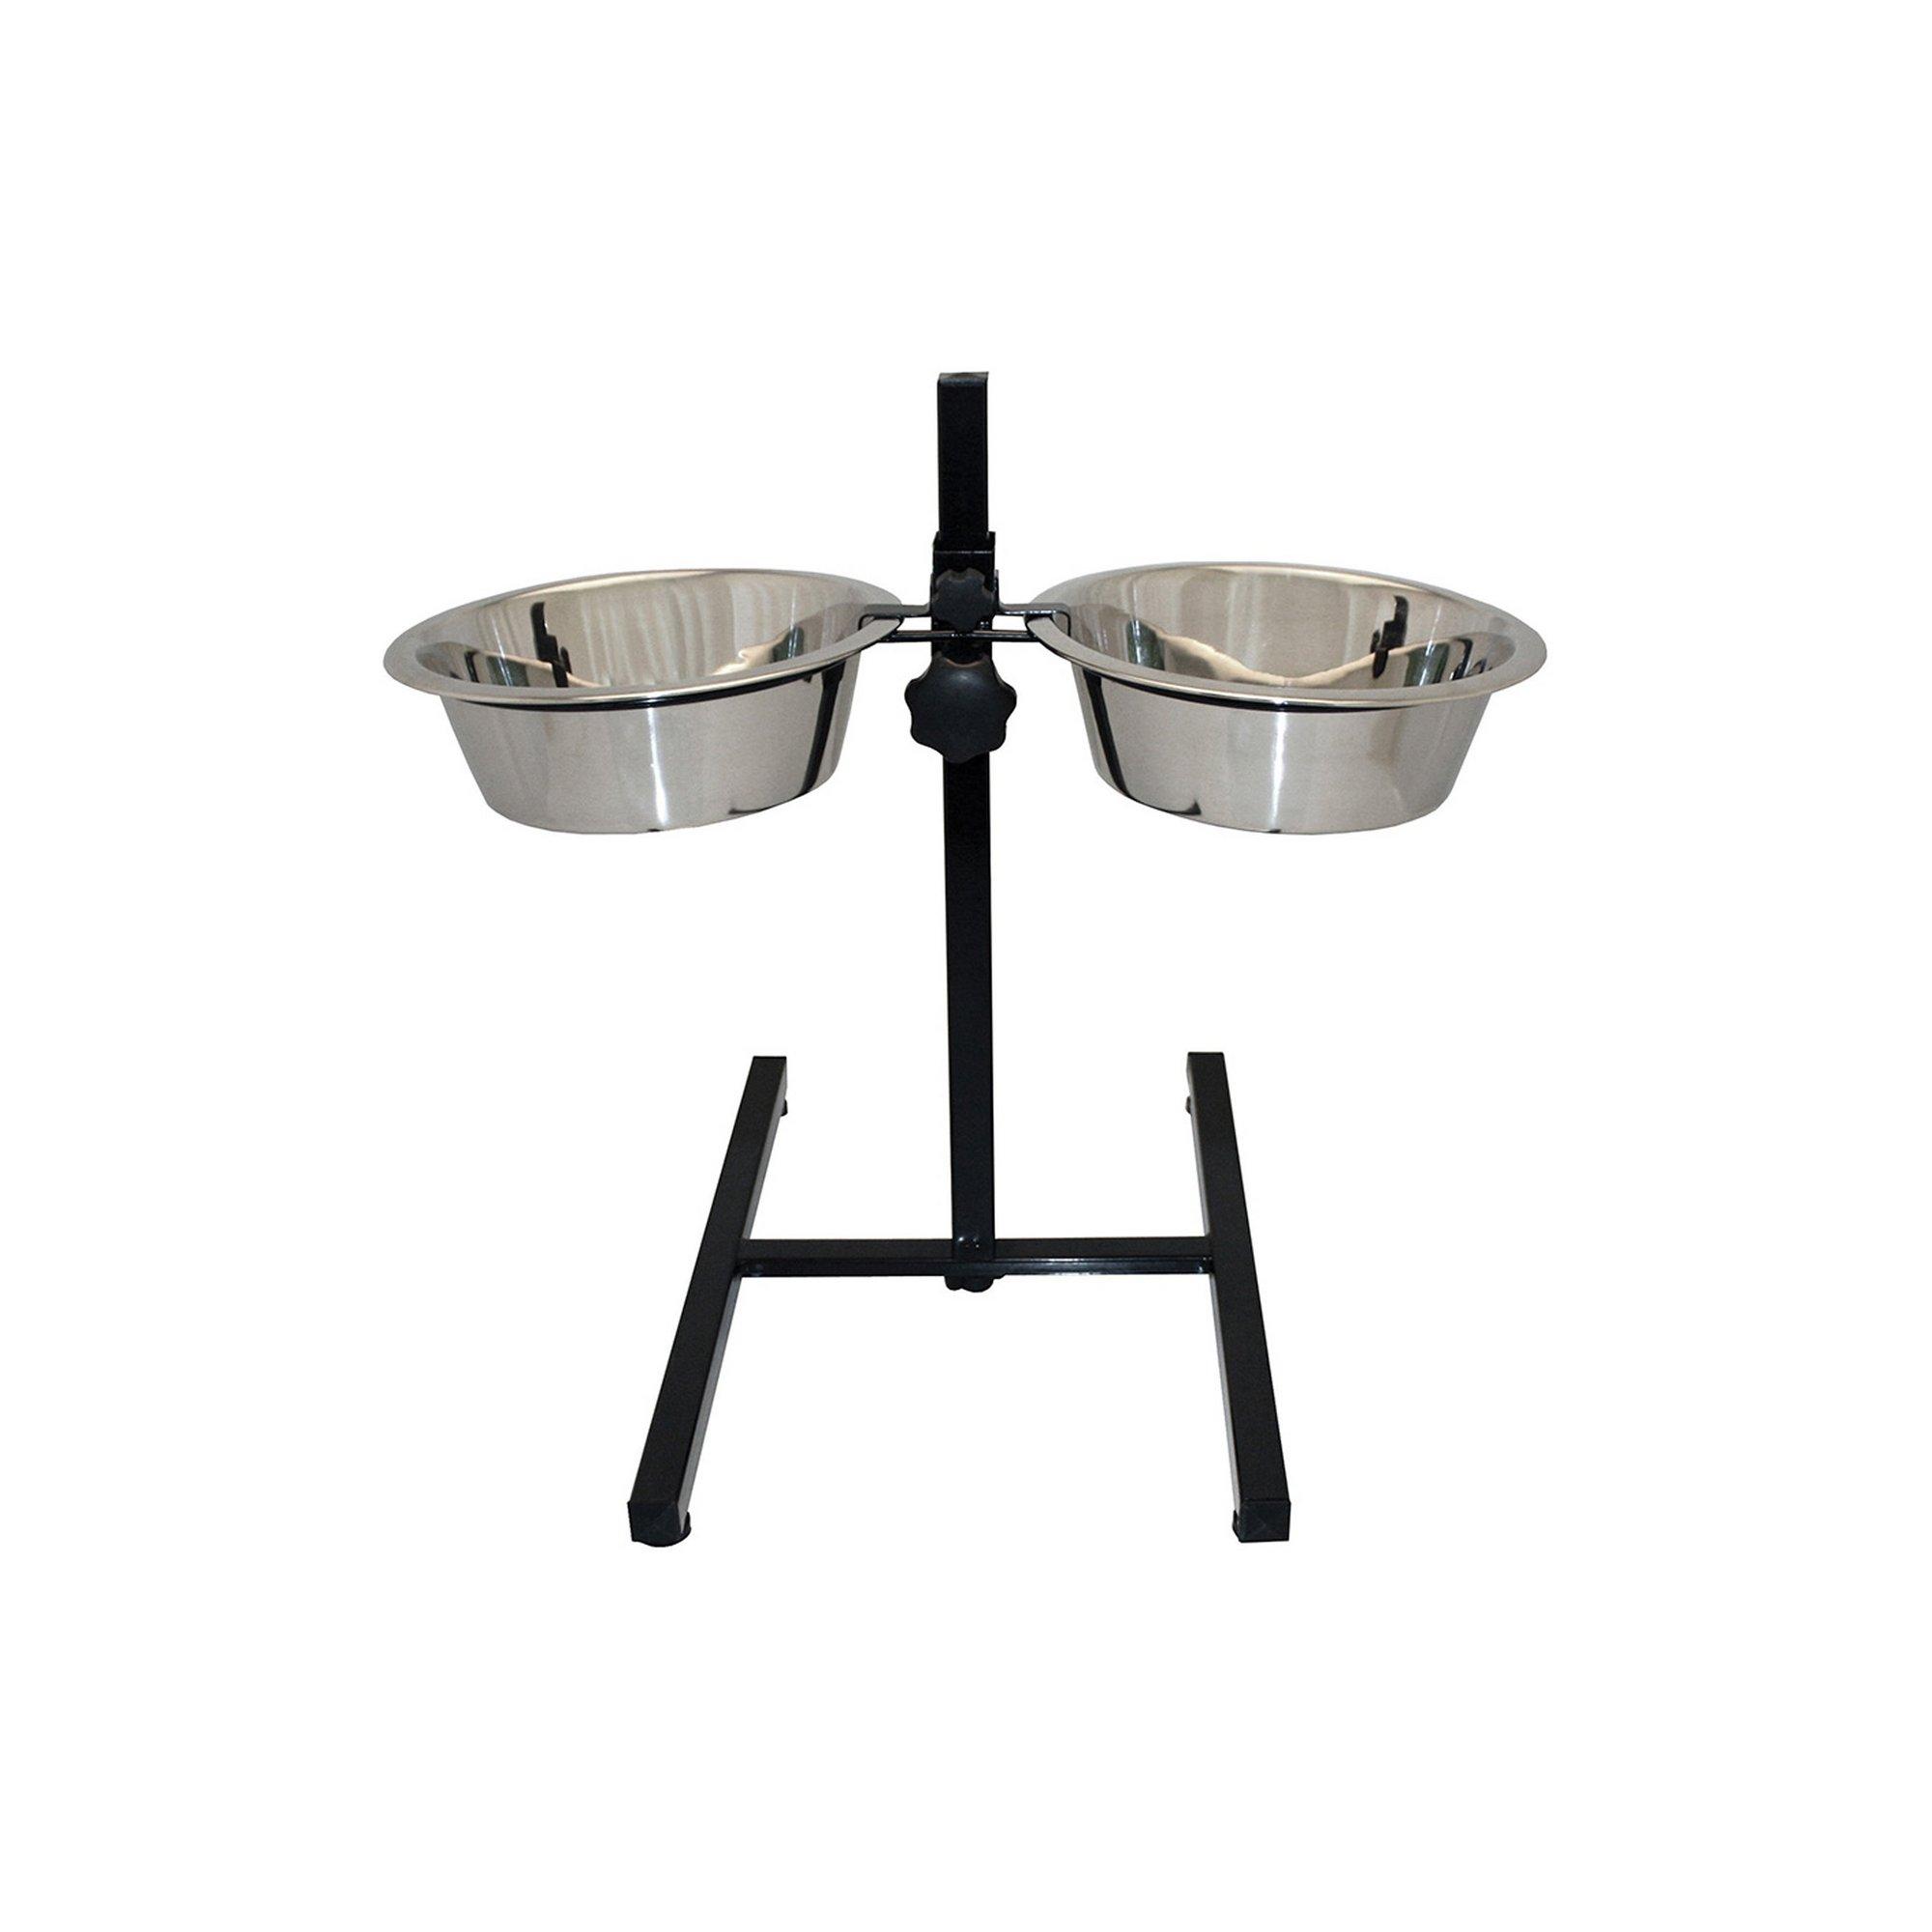 Image of Adjustable Double Diner Pet Bowl 21.5cm